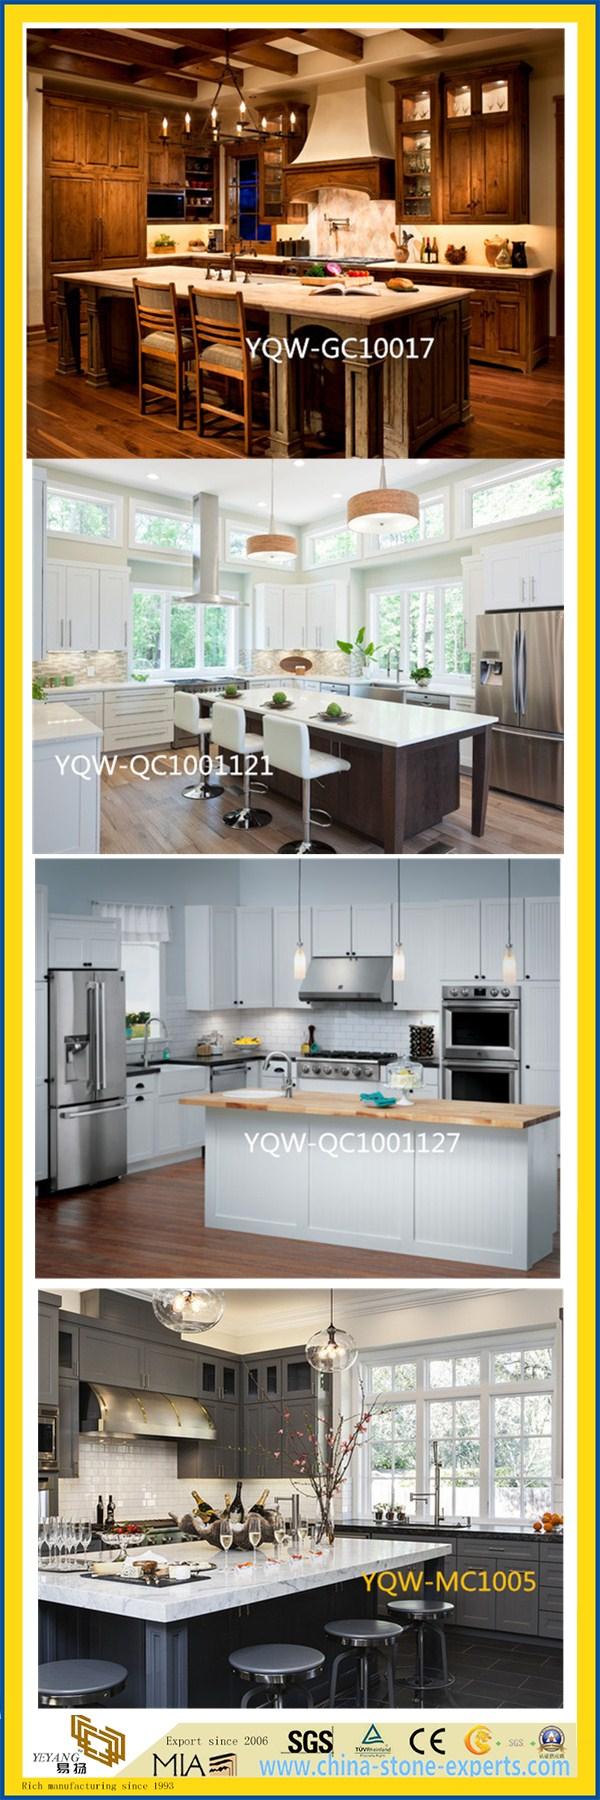 Pure White/Black/Yellow/Grey/Green Polished Artificial Quartz/Granite/Marble Stone Countertop for Kitchen/Bathroom/Hotel